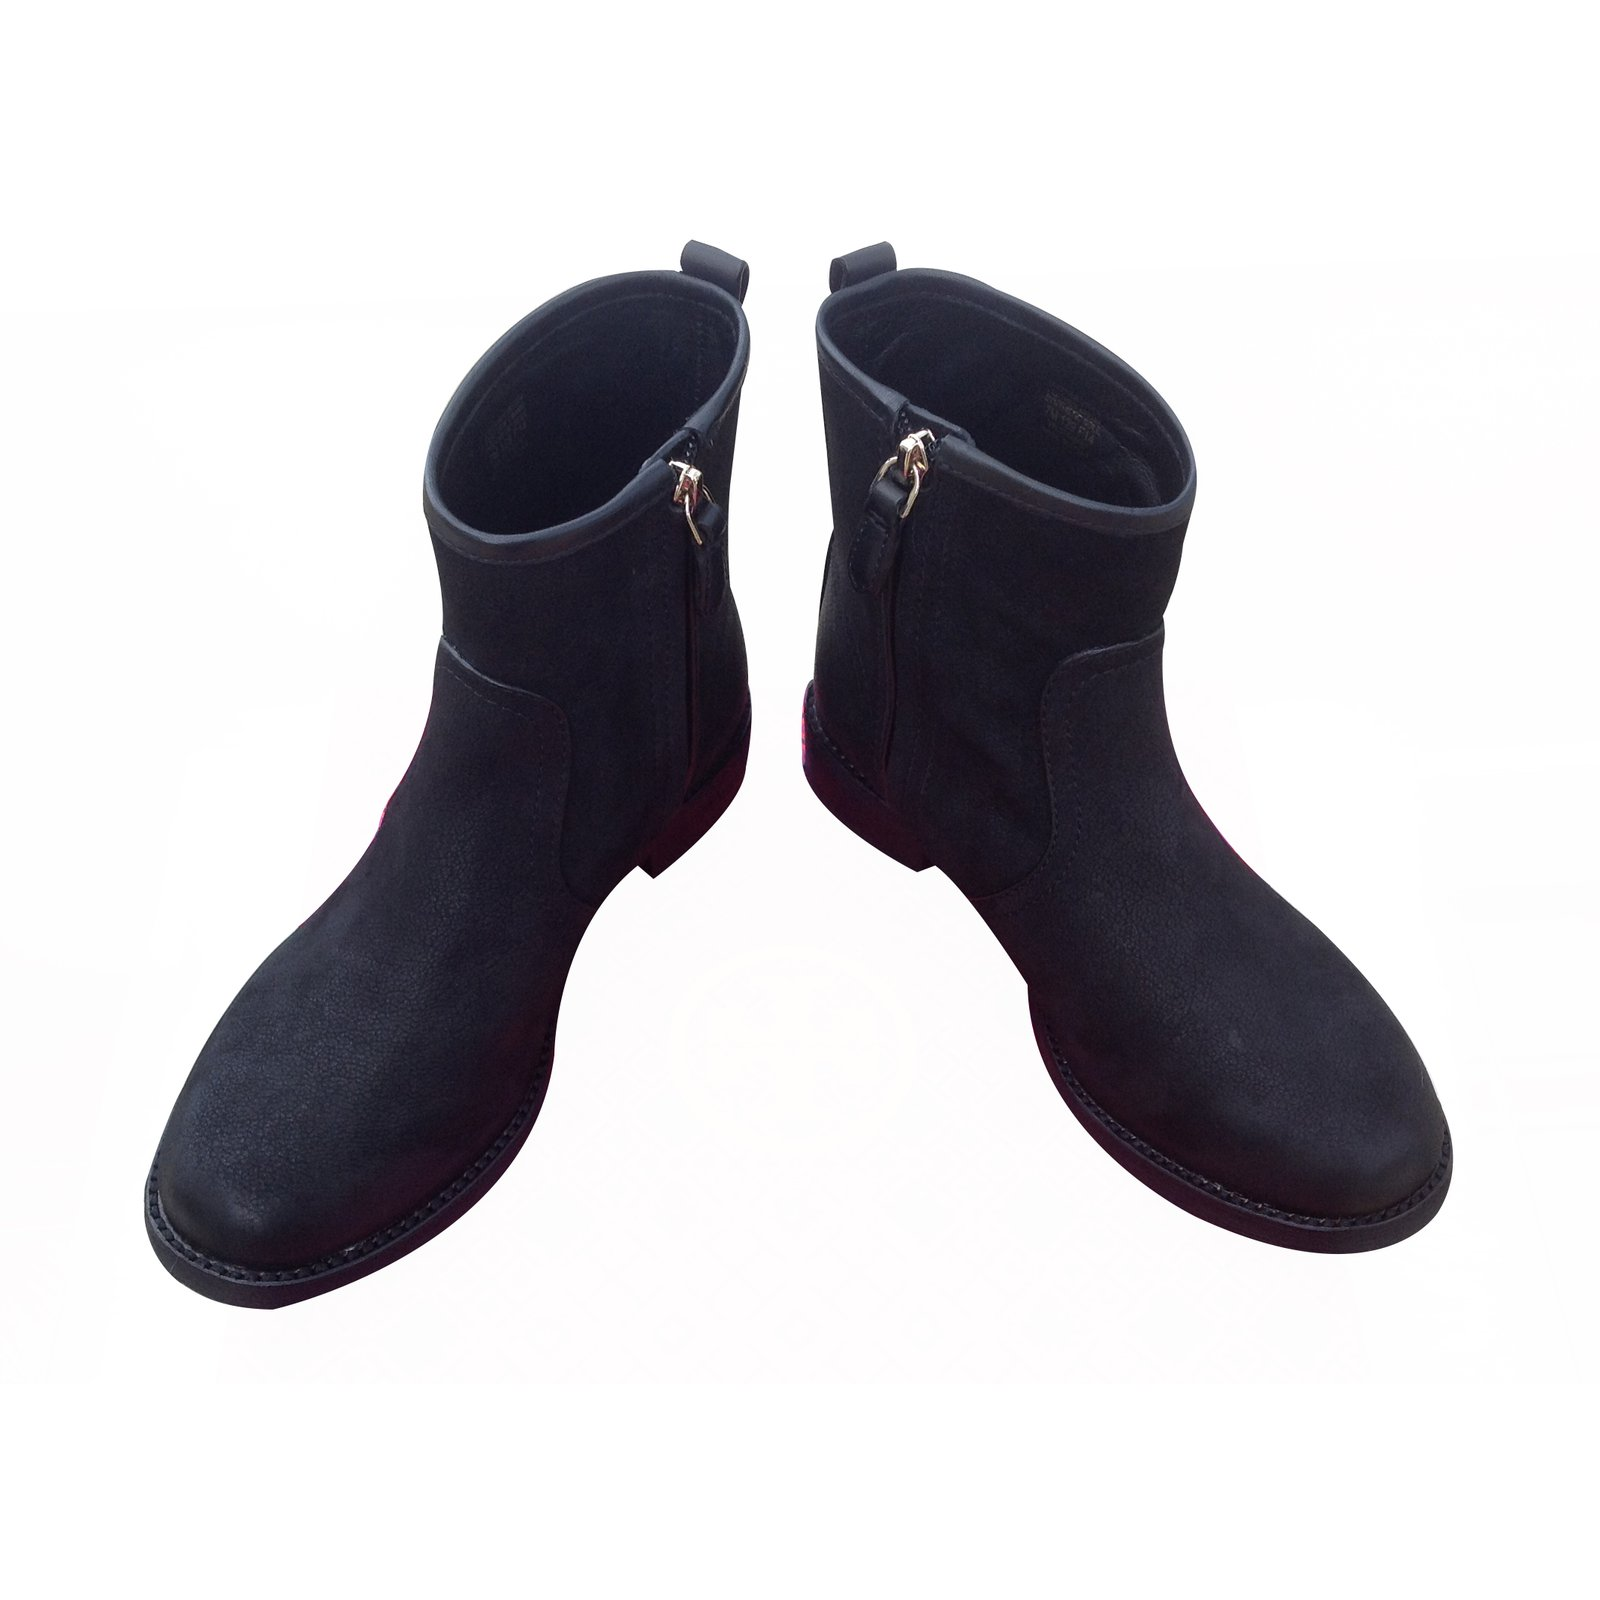 4c28d3465ce Tory Burch Simone Vintage Buffalo Print Veg leather Black Boots Ankle Boots  Suede Black ref.